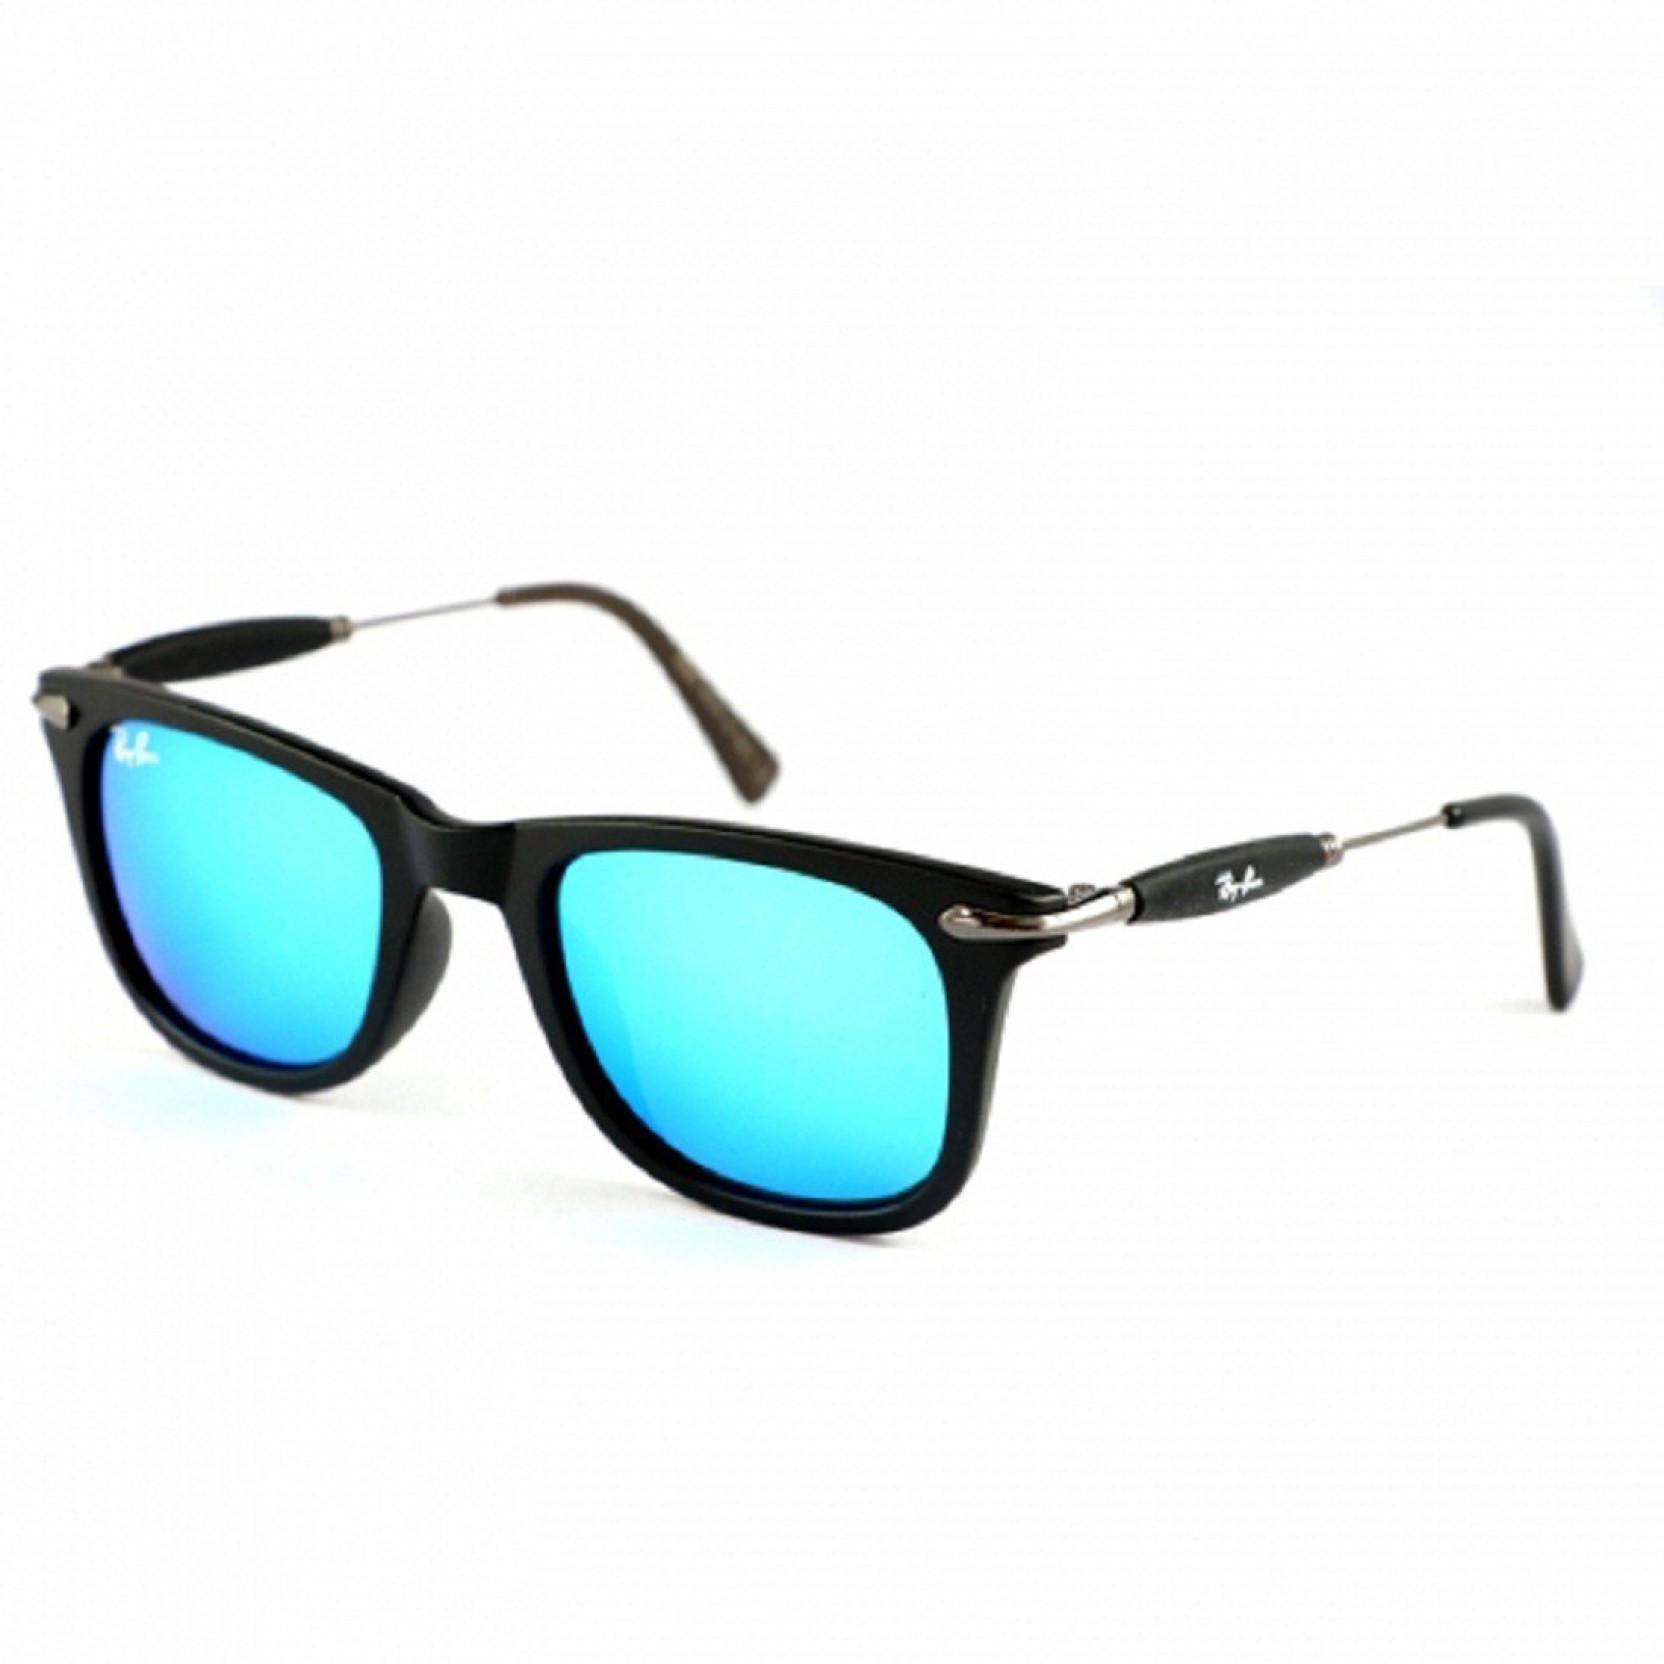 ec0d623245 Buy RB Wayfarer Sunglasses Blue For Men   Women Online   Best Prices ...